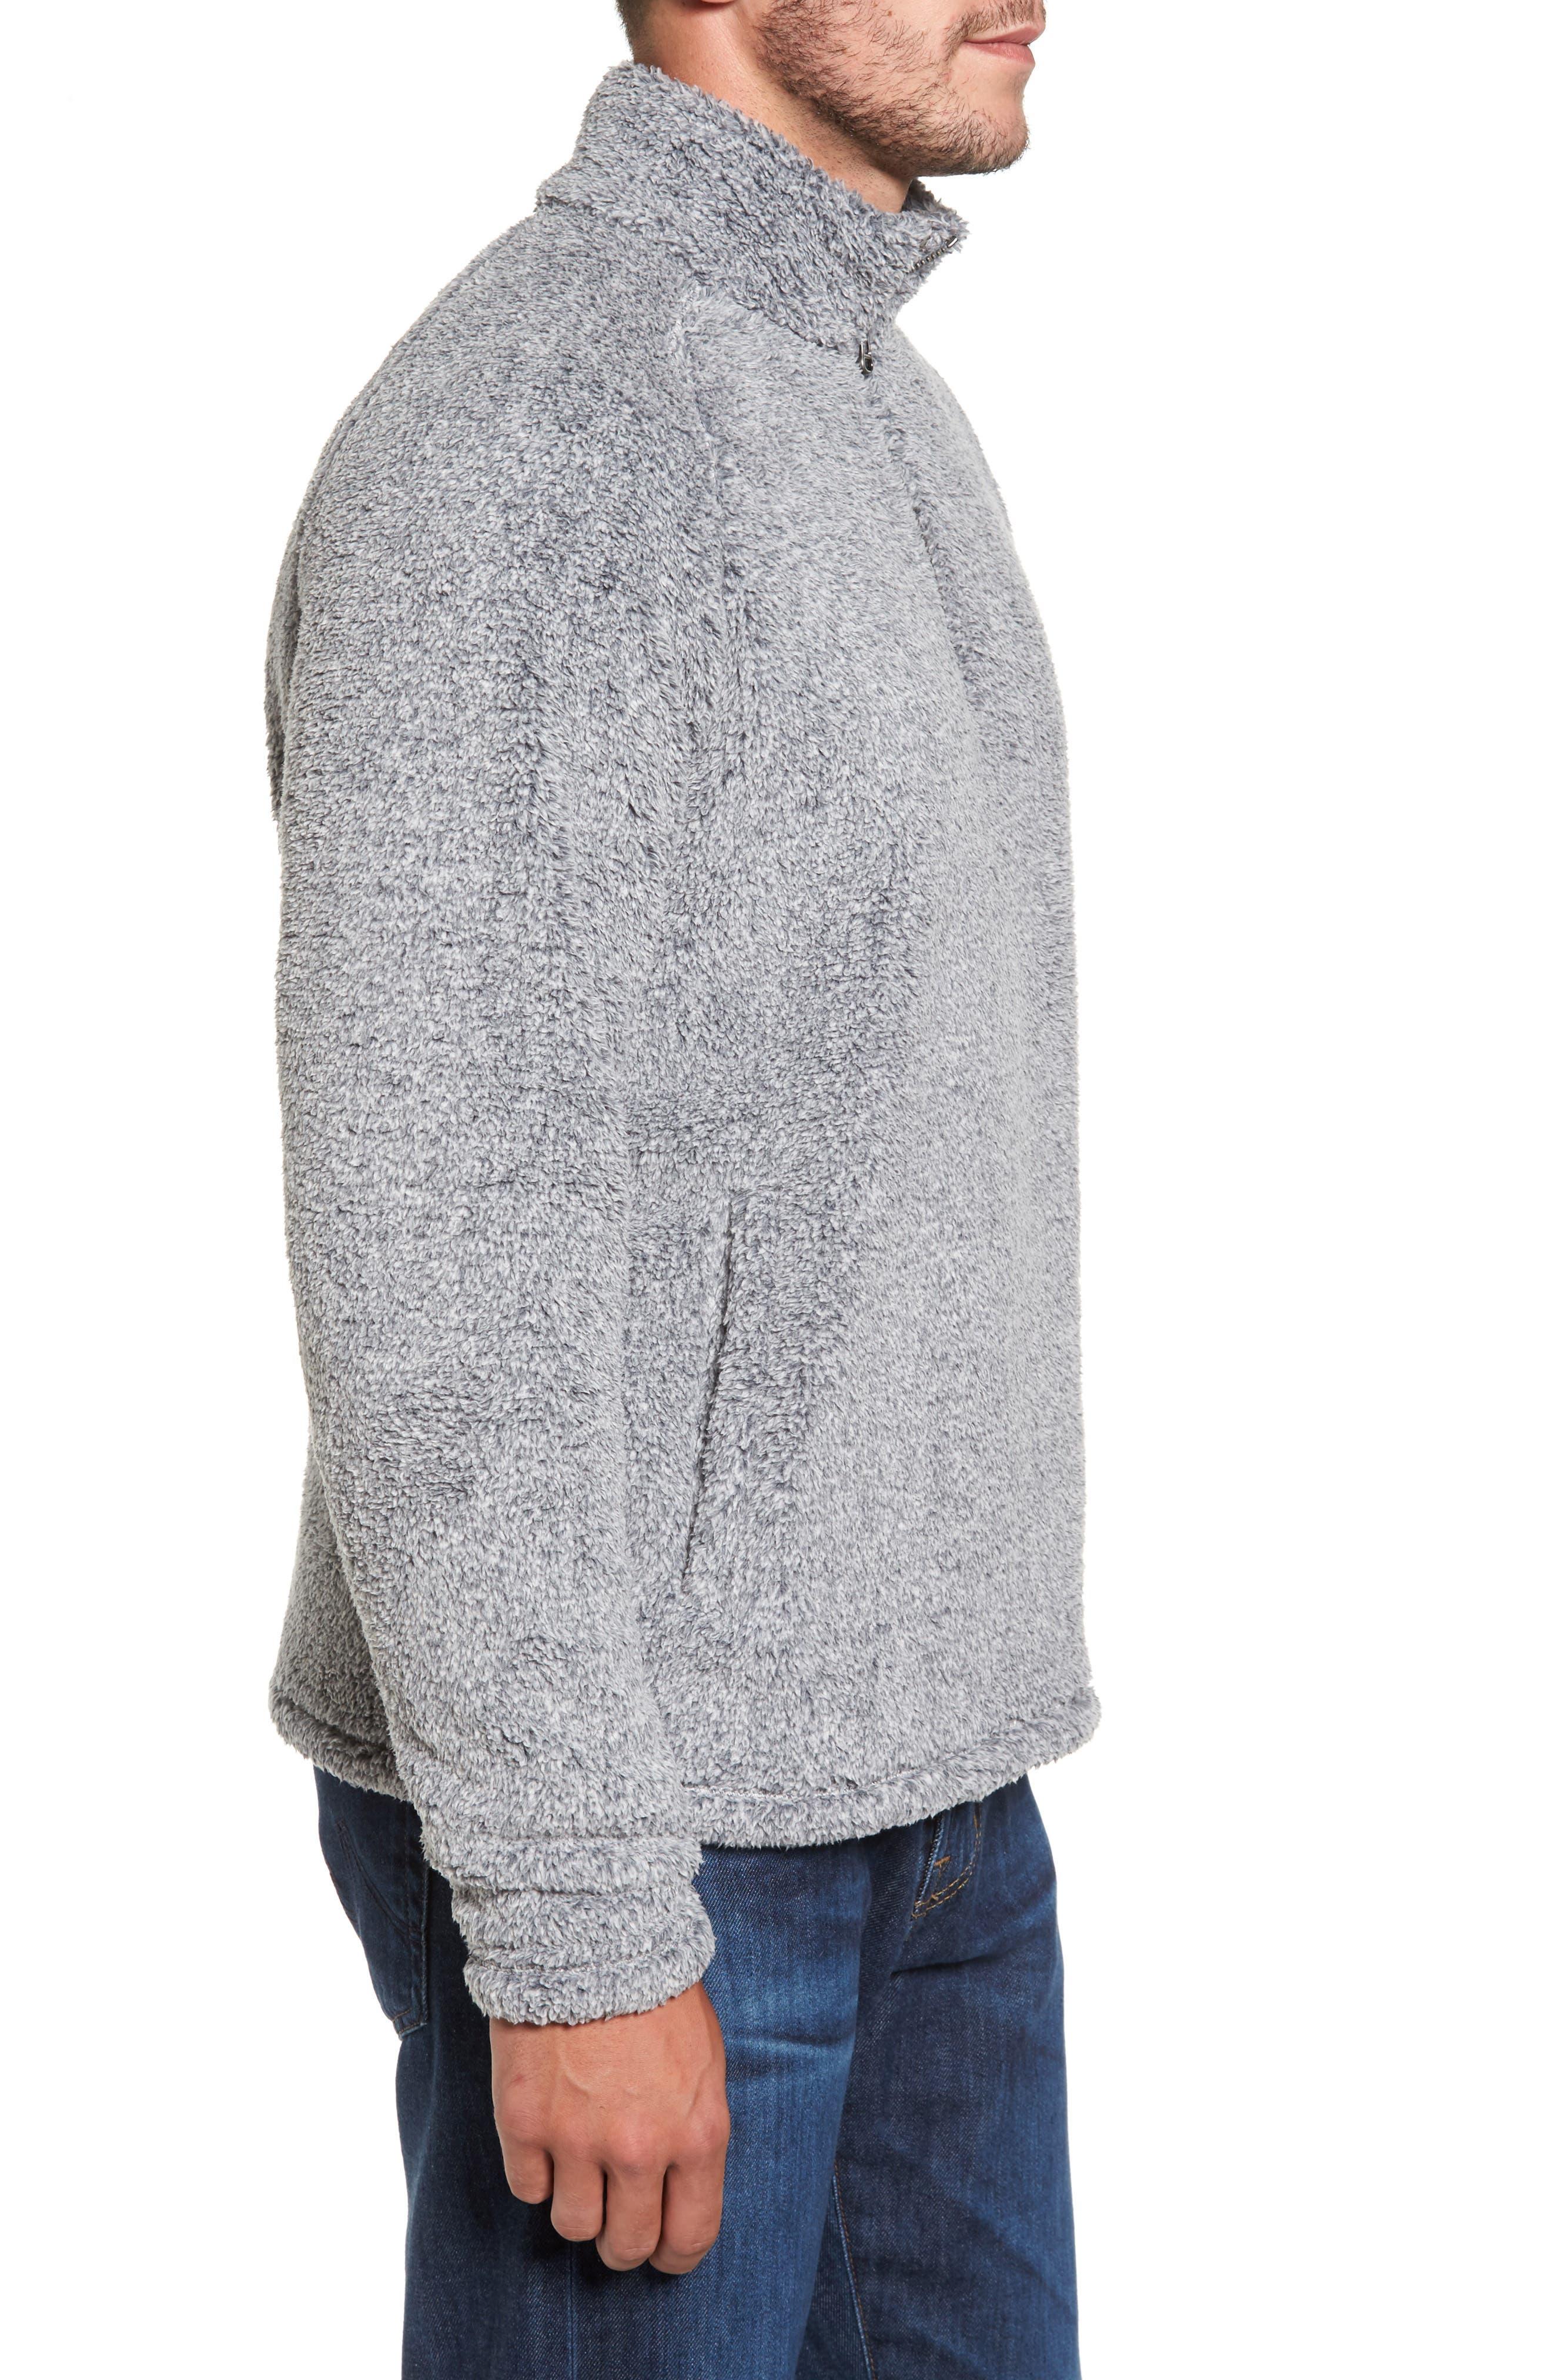 Polar Fleece Quarter Zip Pullover,                             Alternate thumbnail 3, color,                             Black Caviar Heather